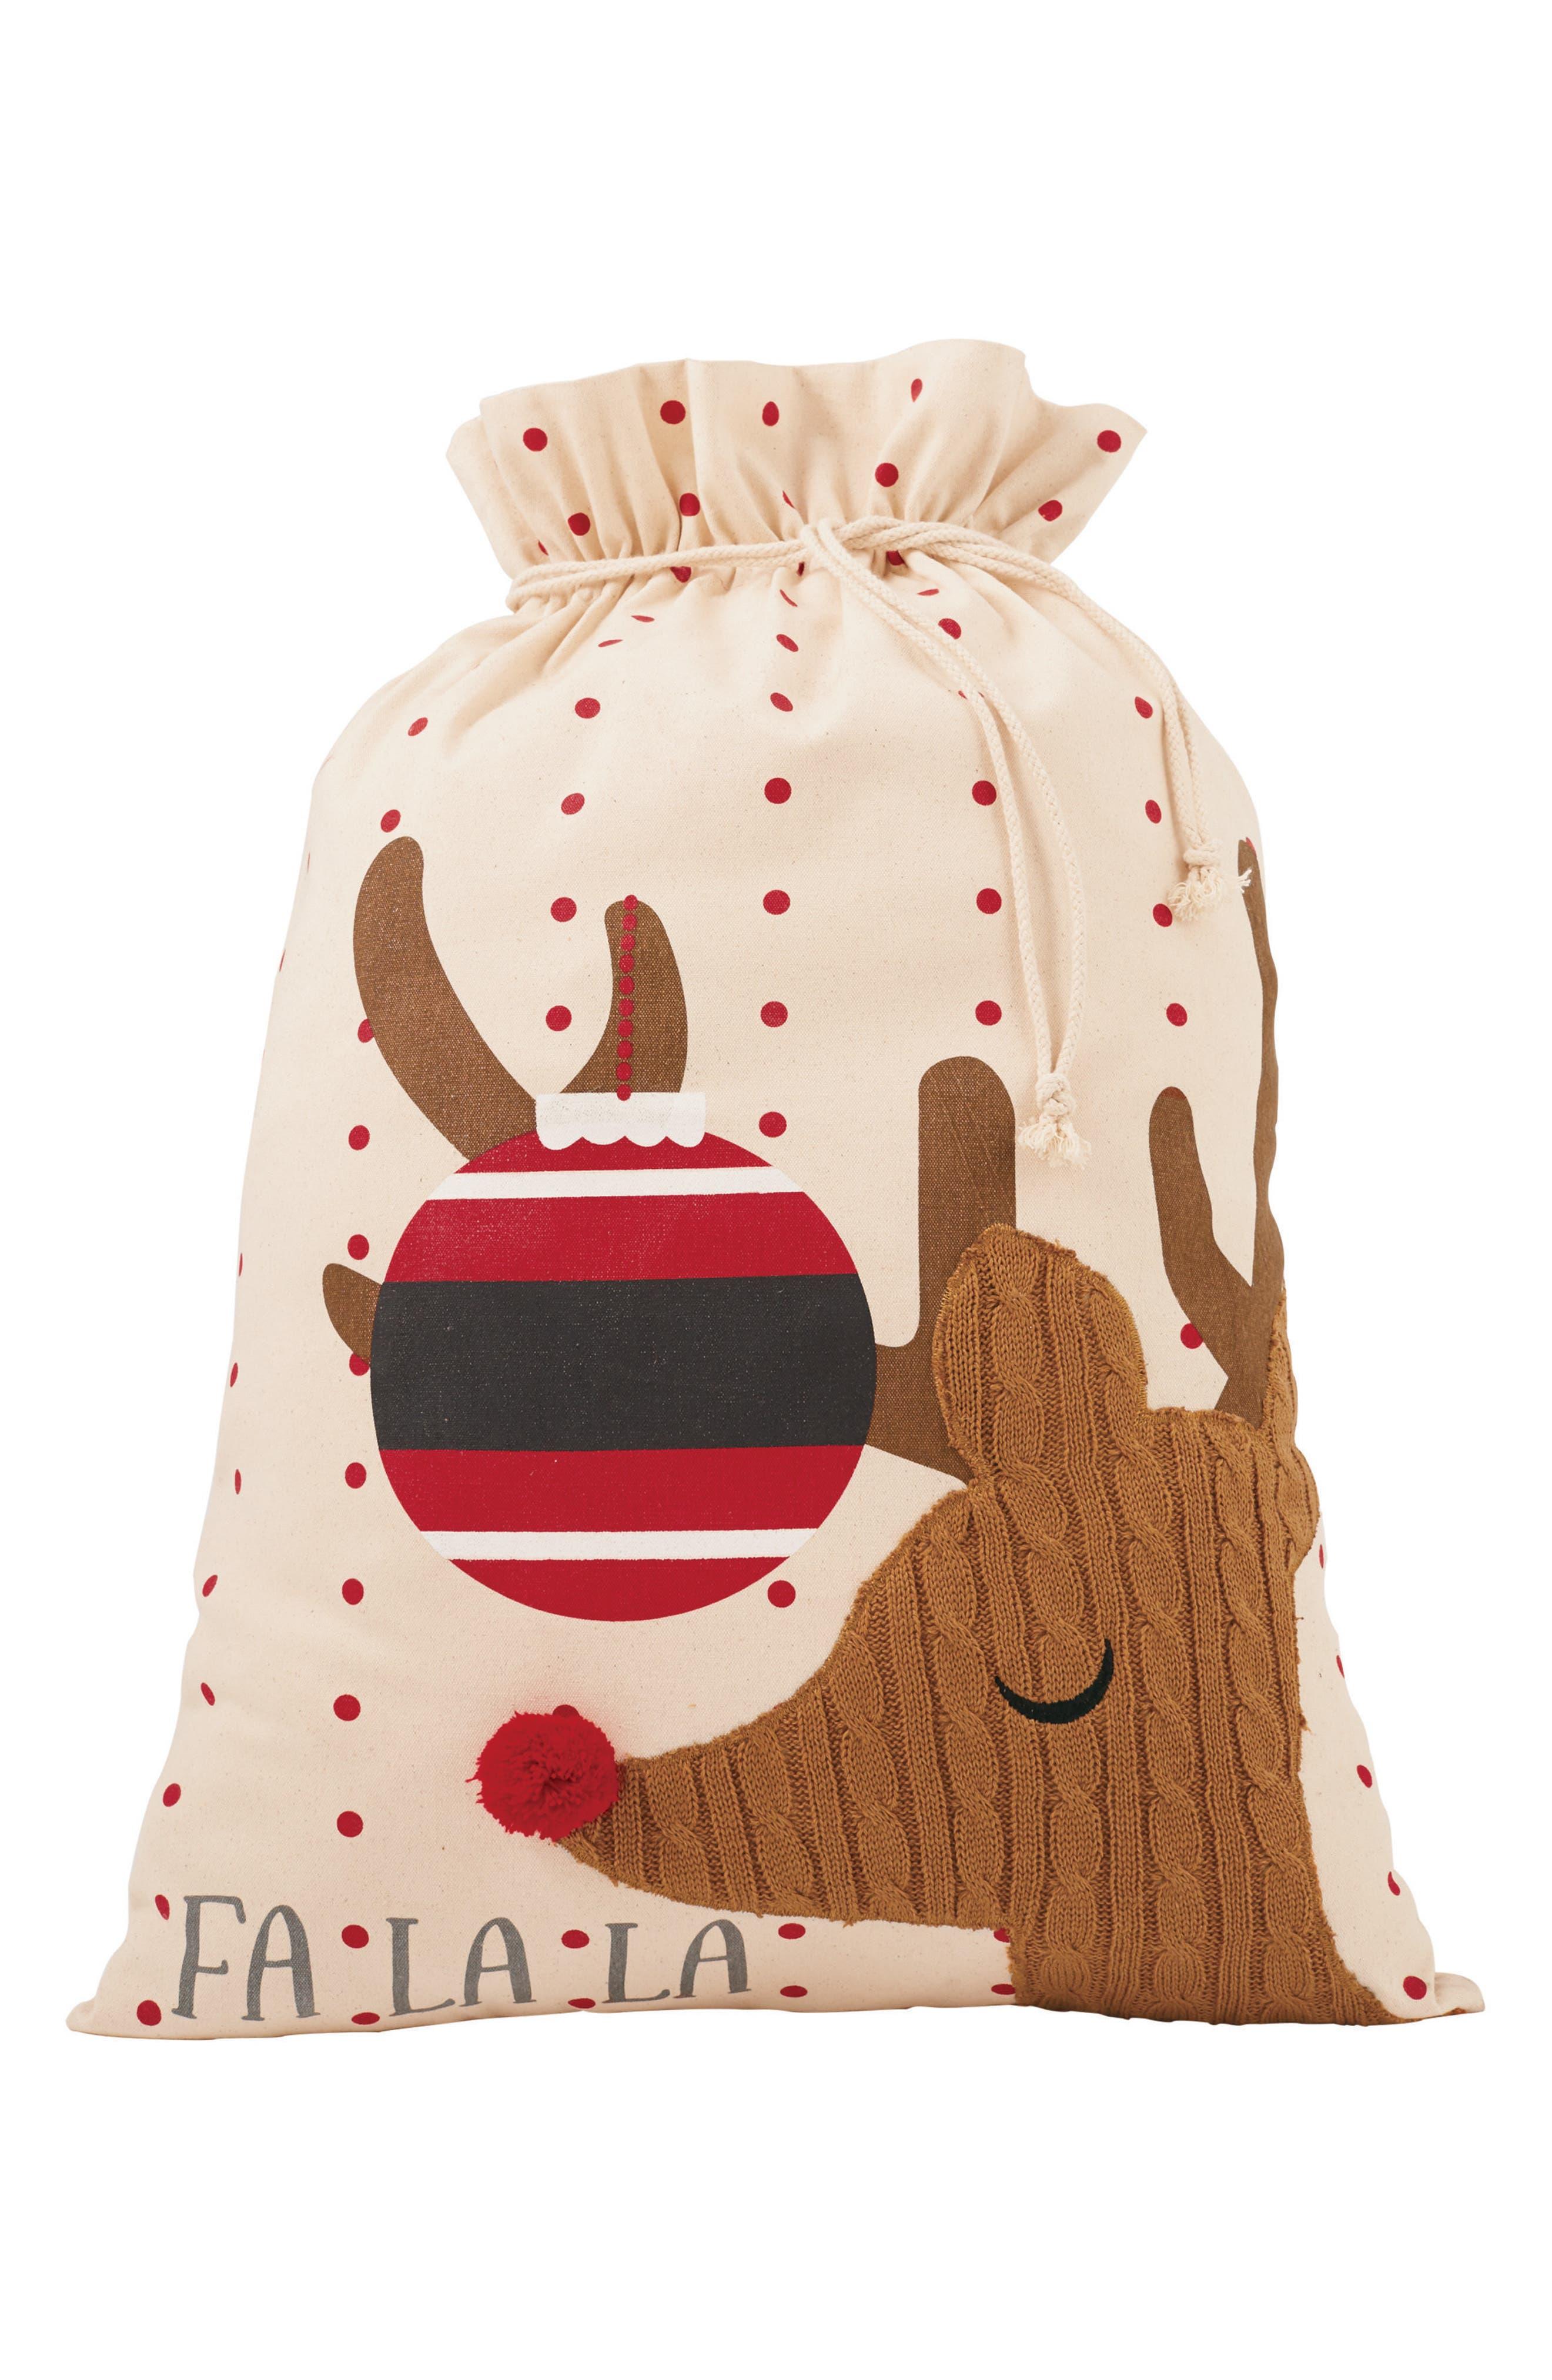 Alternate Image 1 Selected - Mud Pie Fa La La Reindeer Canvas Gift Sack